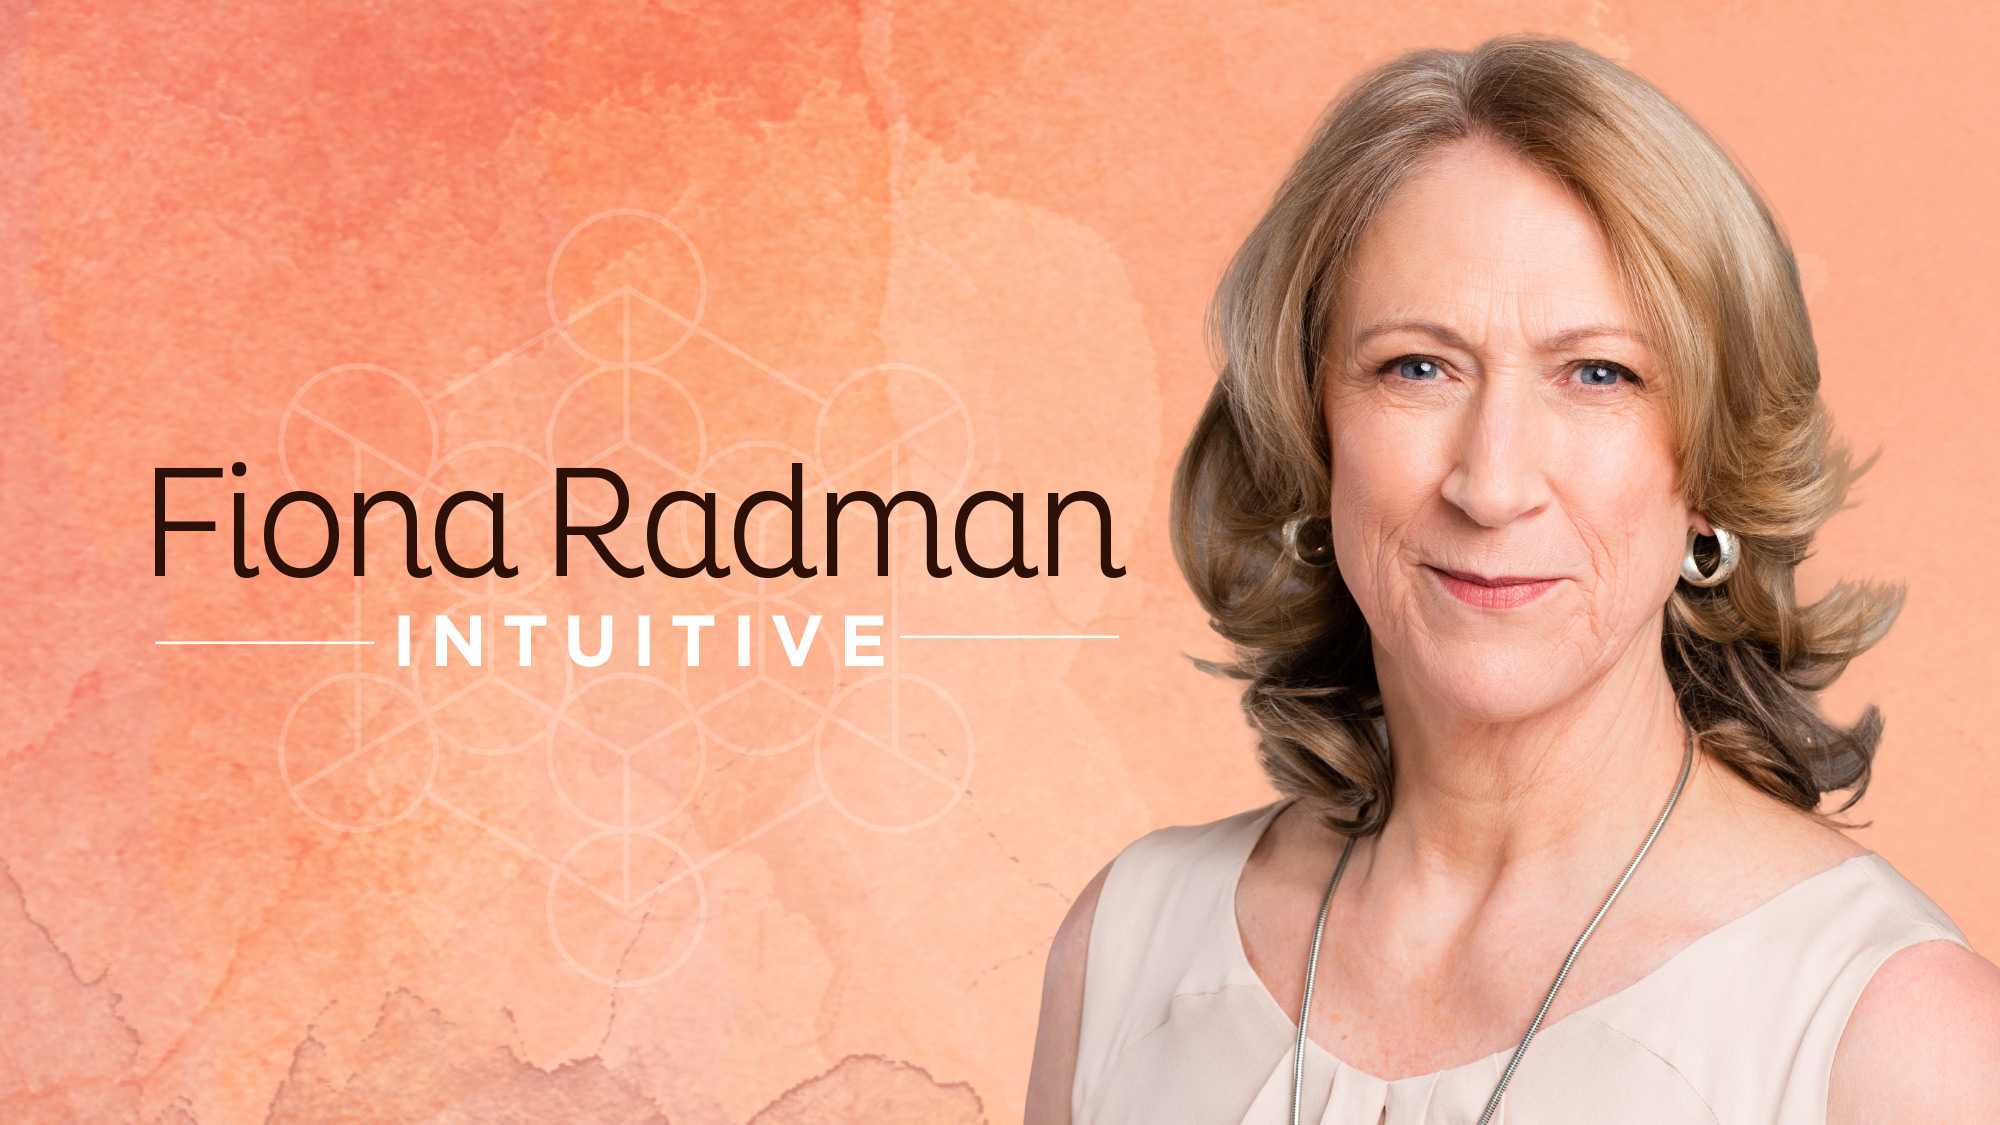 Fiona Radman